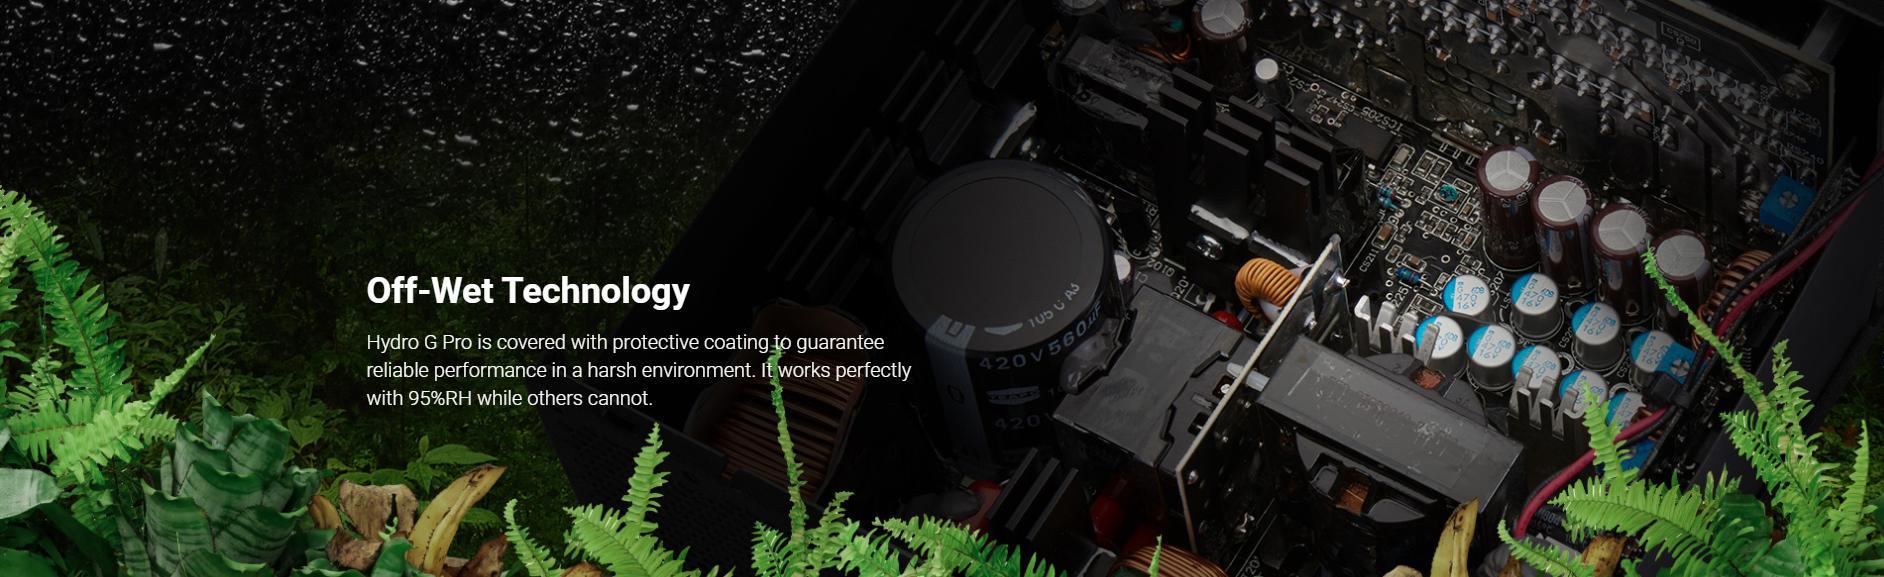 FSP Power Supply HYDRO G PRO Series Model HG2-850 - Active PFC - 80 Plus Gold - Full Modular giới thiệu 9